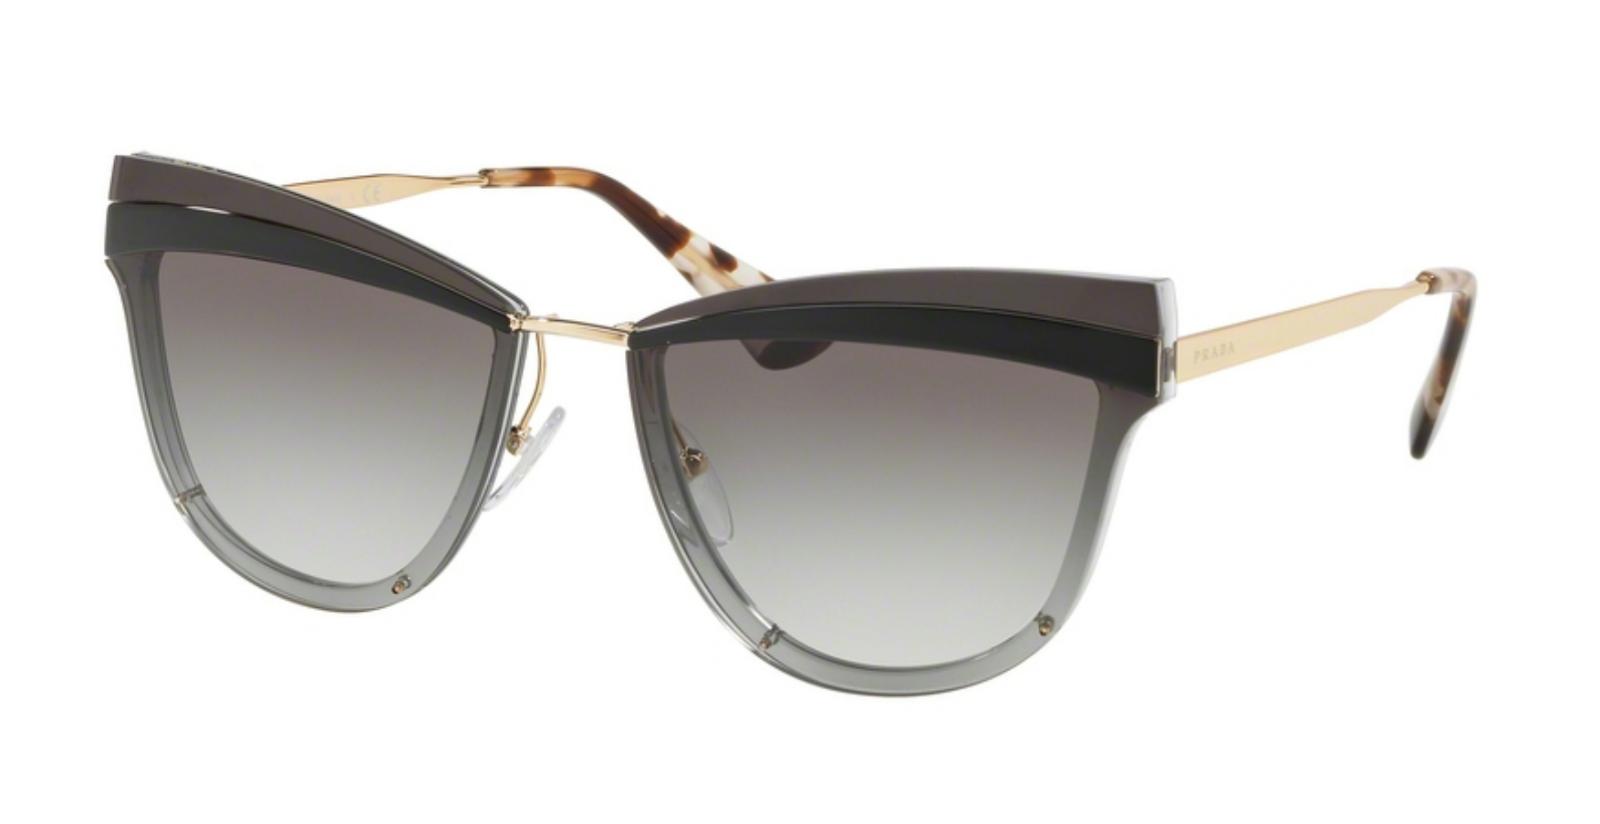 a87b5f6ab4 Brand New Prada Sunglasses PR 12US KUI 0A7 Gold Black Grey Gradient For  Women -  480.15